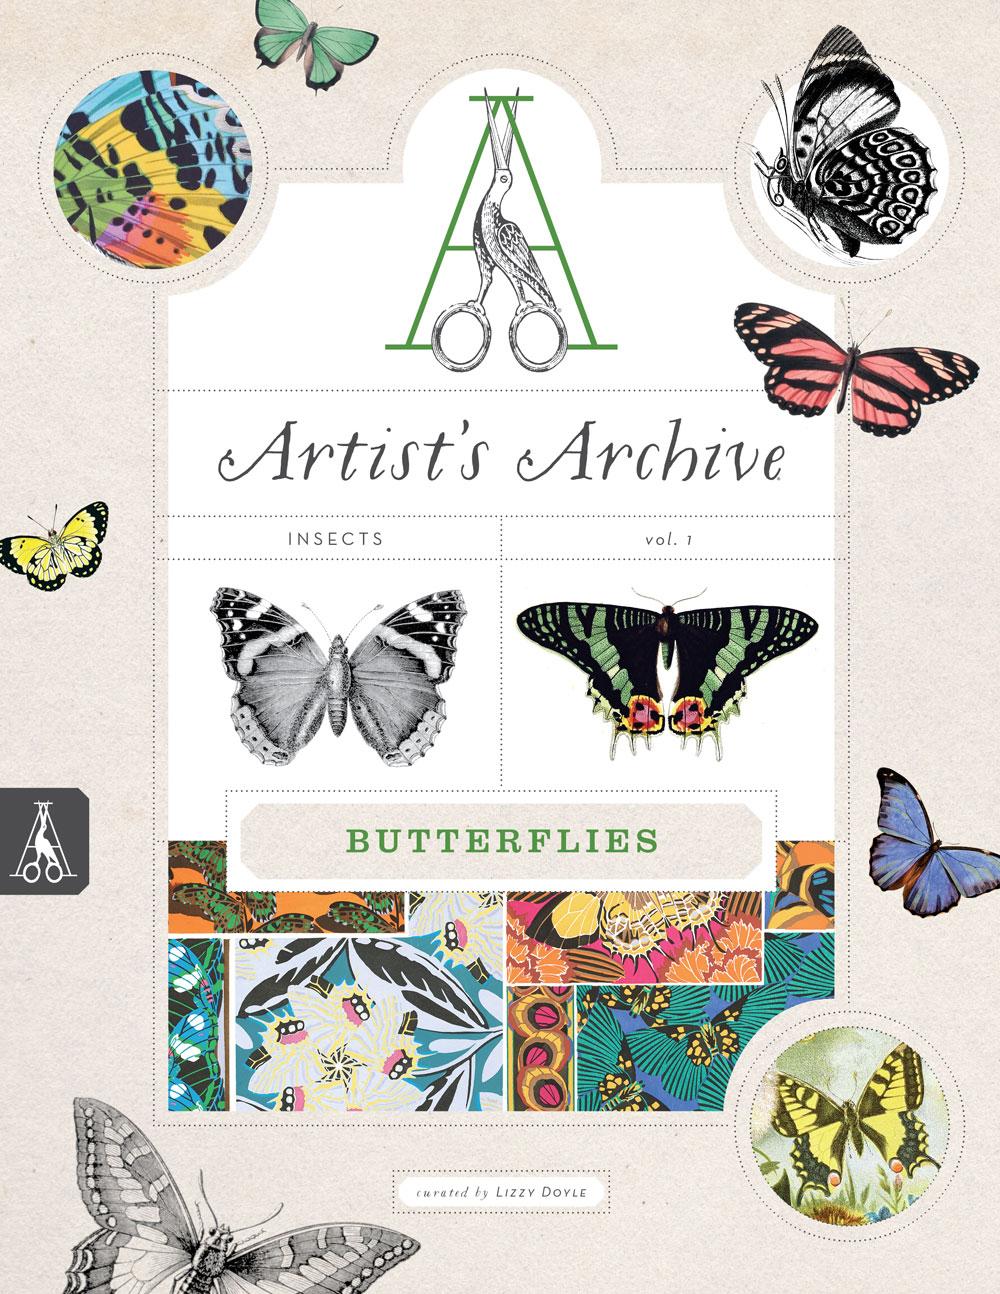 Butterflies_ArtistsArchive.jpg